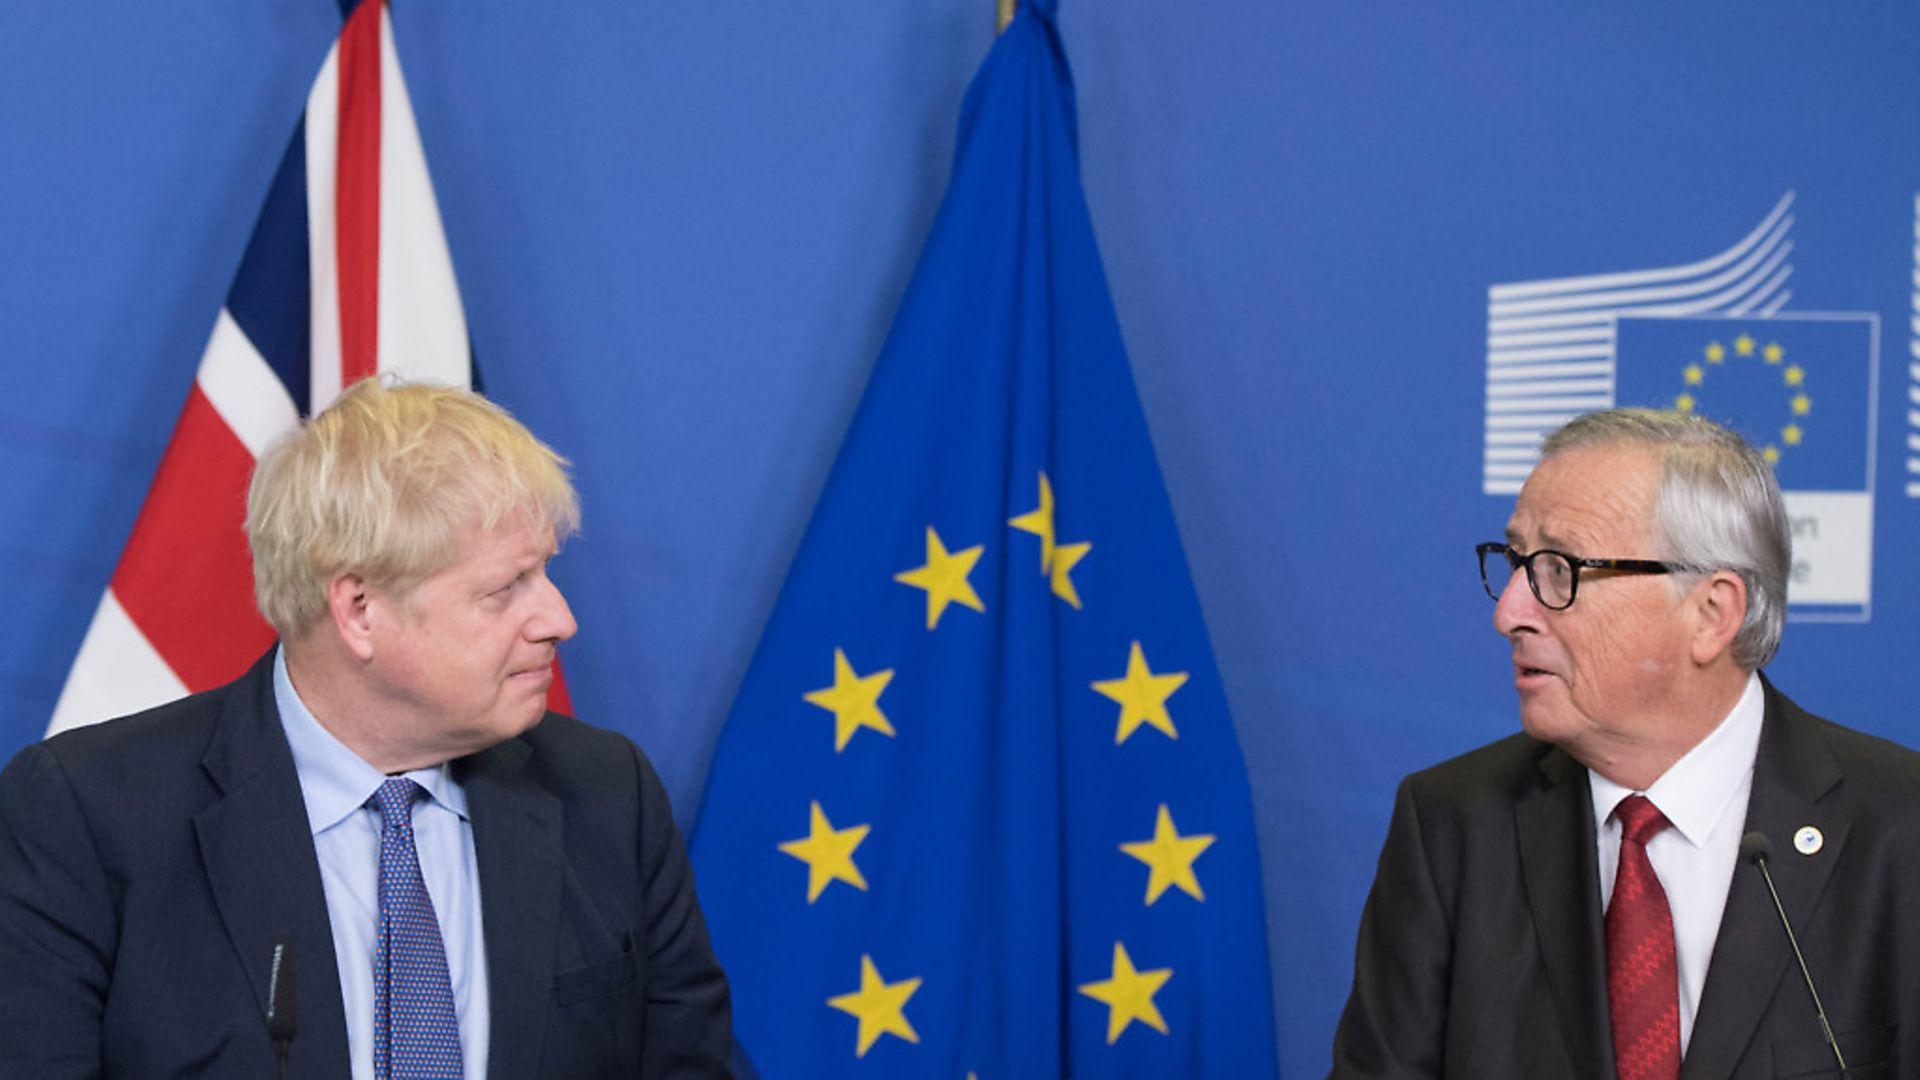 UK Prime Minister Boris Johnson (left) and Jean-Claude Juncker. Photograph: Stefan Rousseau/PA Wire. - Credit: PA